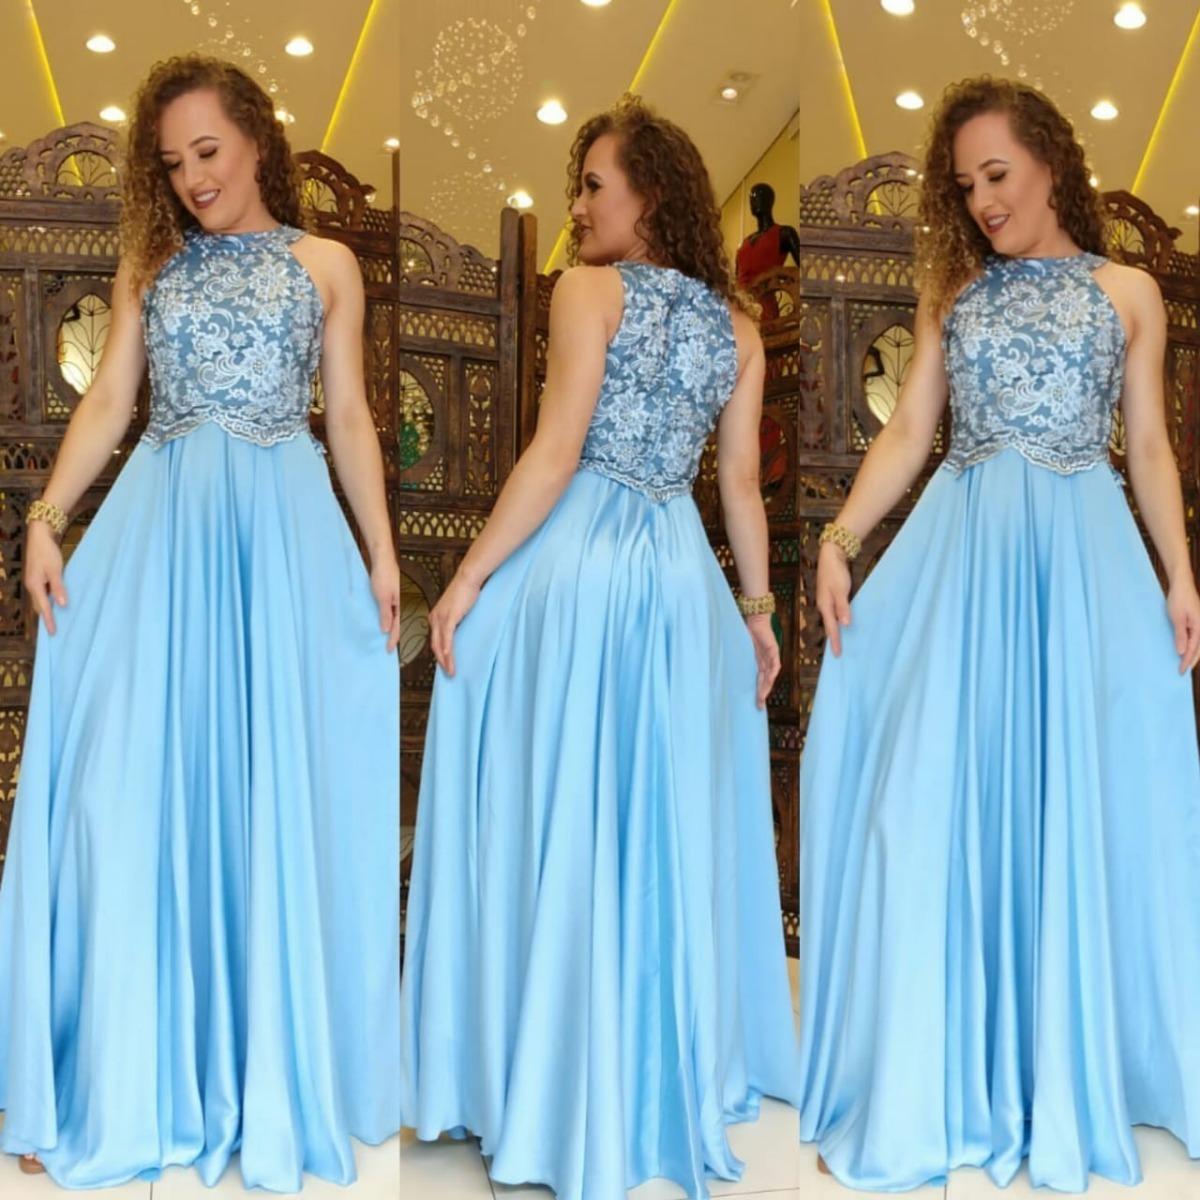 da4bfd7aaa vestido festa longo azul serenity madrinha casamento civil. Carregando zoom.